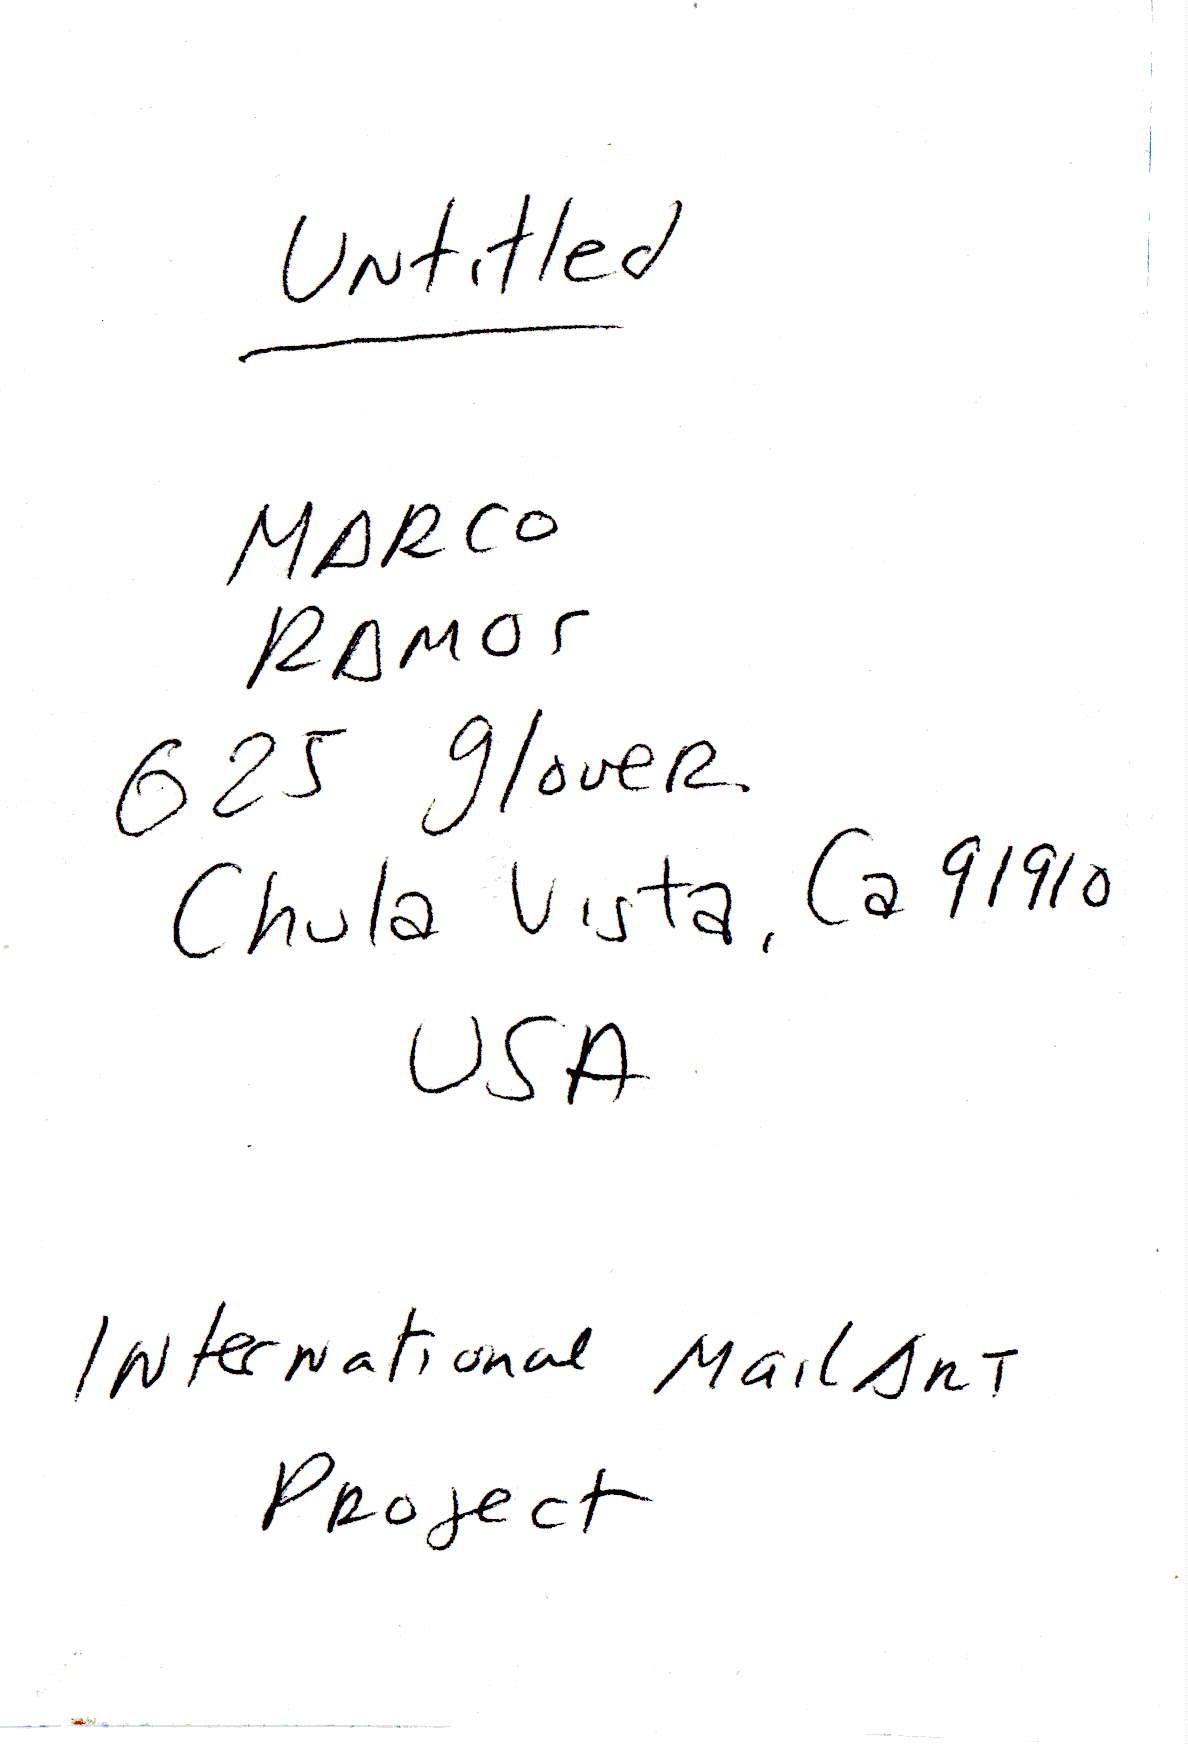 Marco Ramos, San Diego (USA)